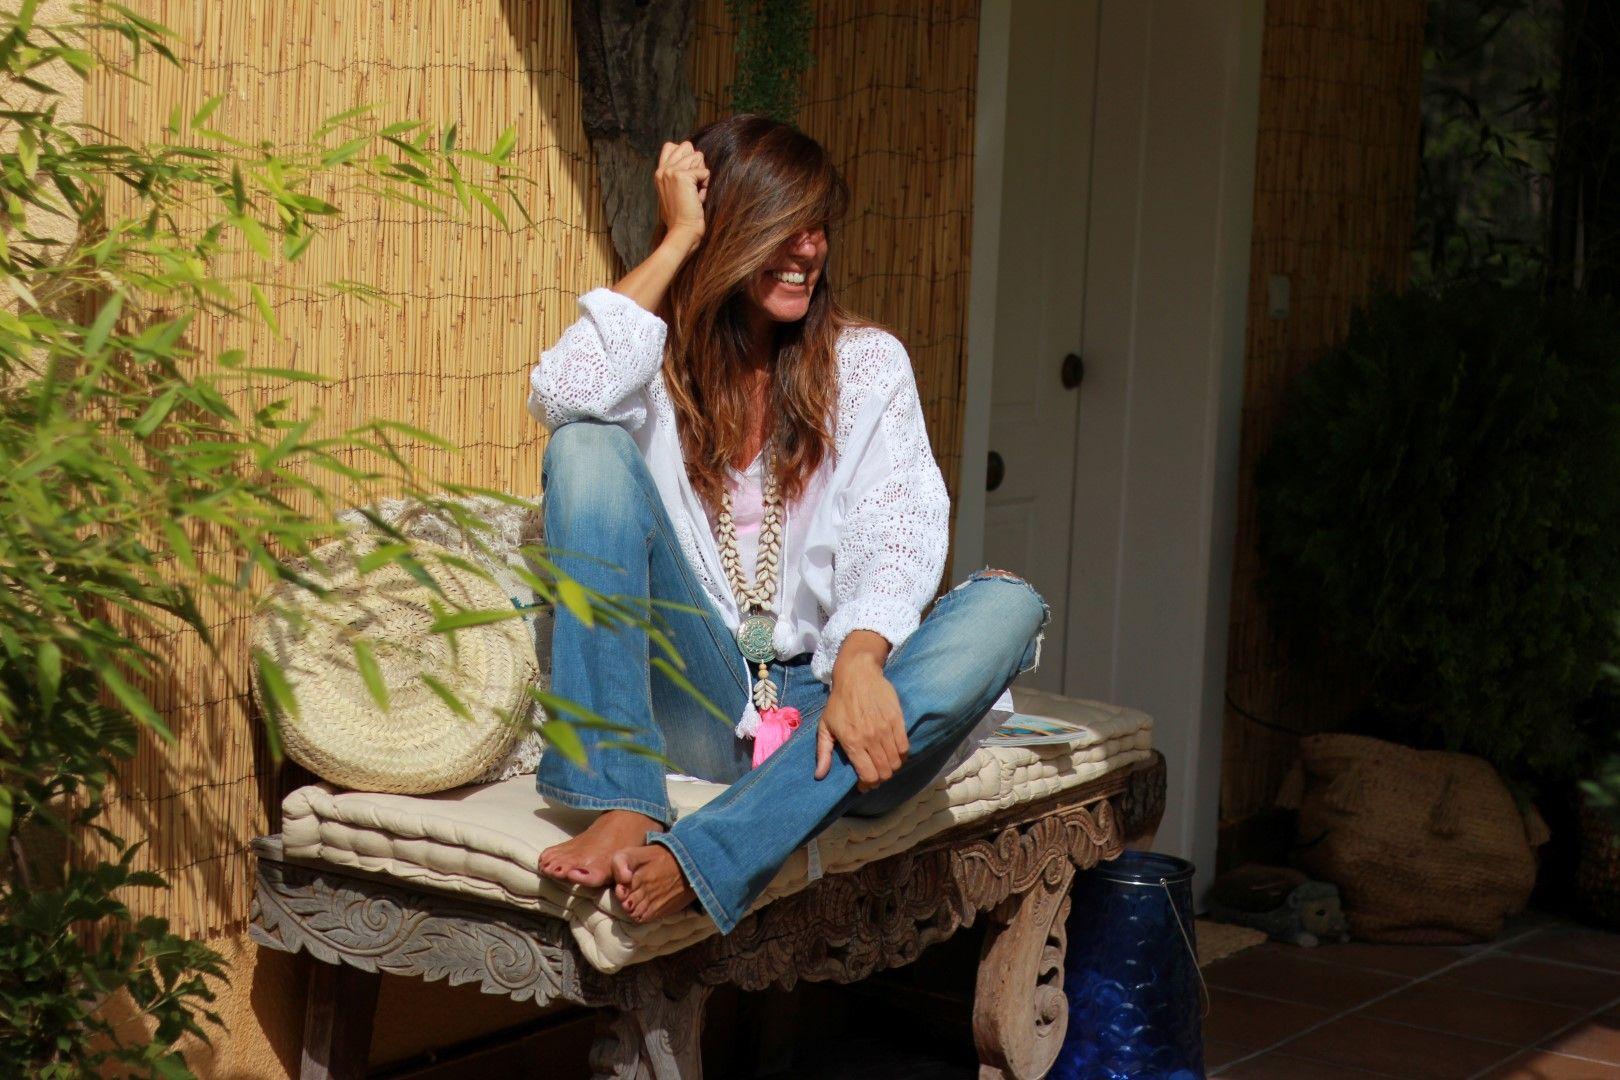 eac15b6972f Hippie Chic Shop in 2019 | My Style | Hippie chic, Chic shop, Chic